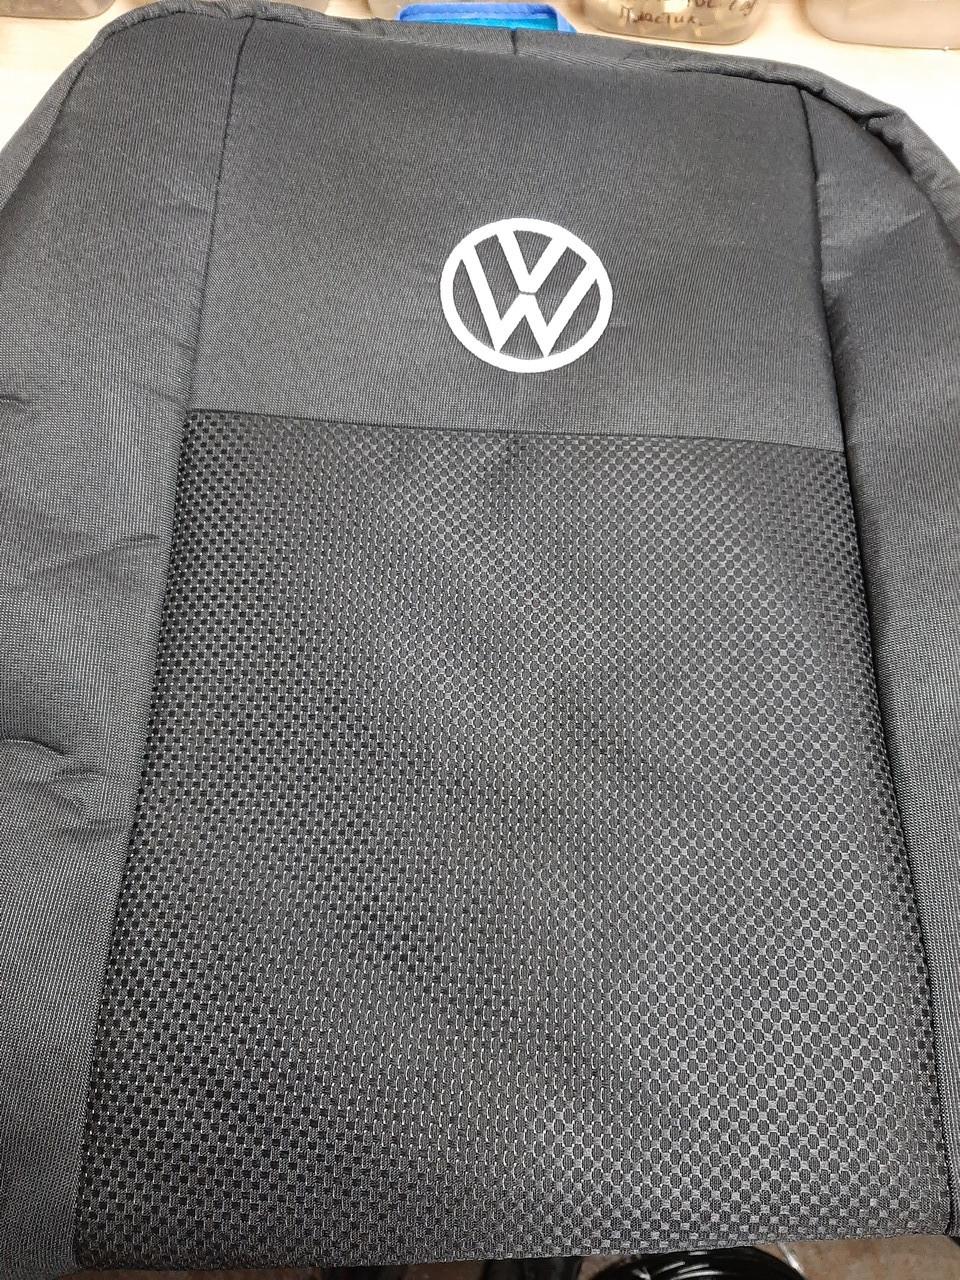 "Чехлы на Фольксваген Бора 1998-2005 / авто чехлы Volkswagen Bora ""Prestige"" эконом"